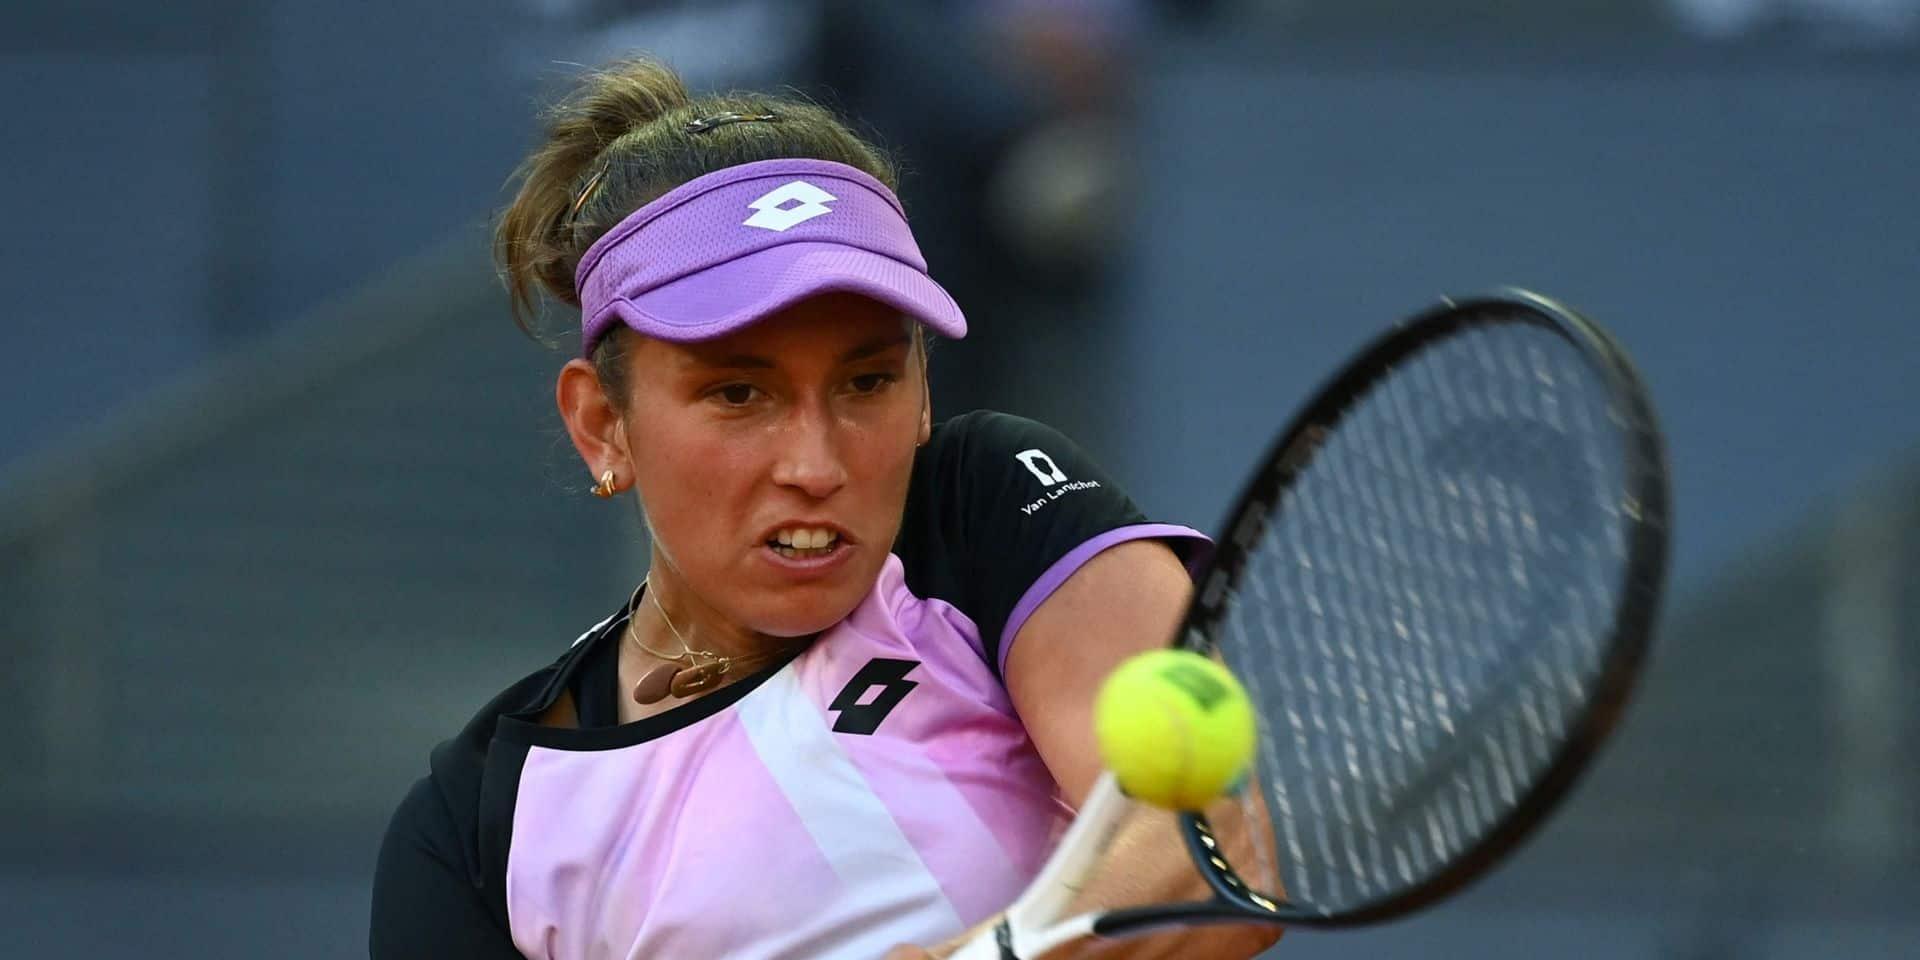 WTA Rome: Elise Mertens retrouve la Russe Veronika Kudermetova, 28e mondiale, au premier tour